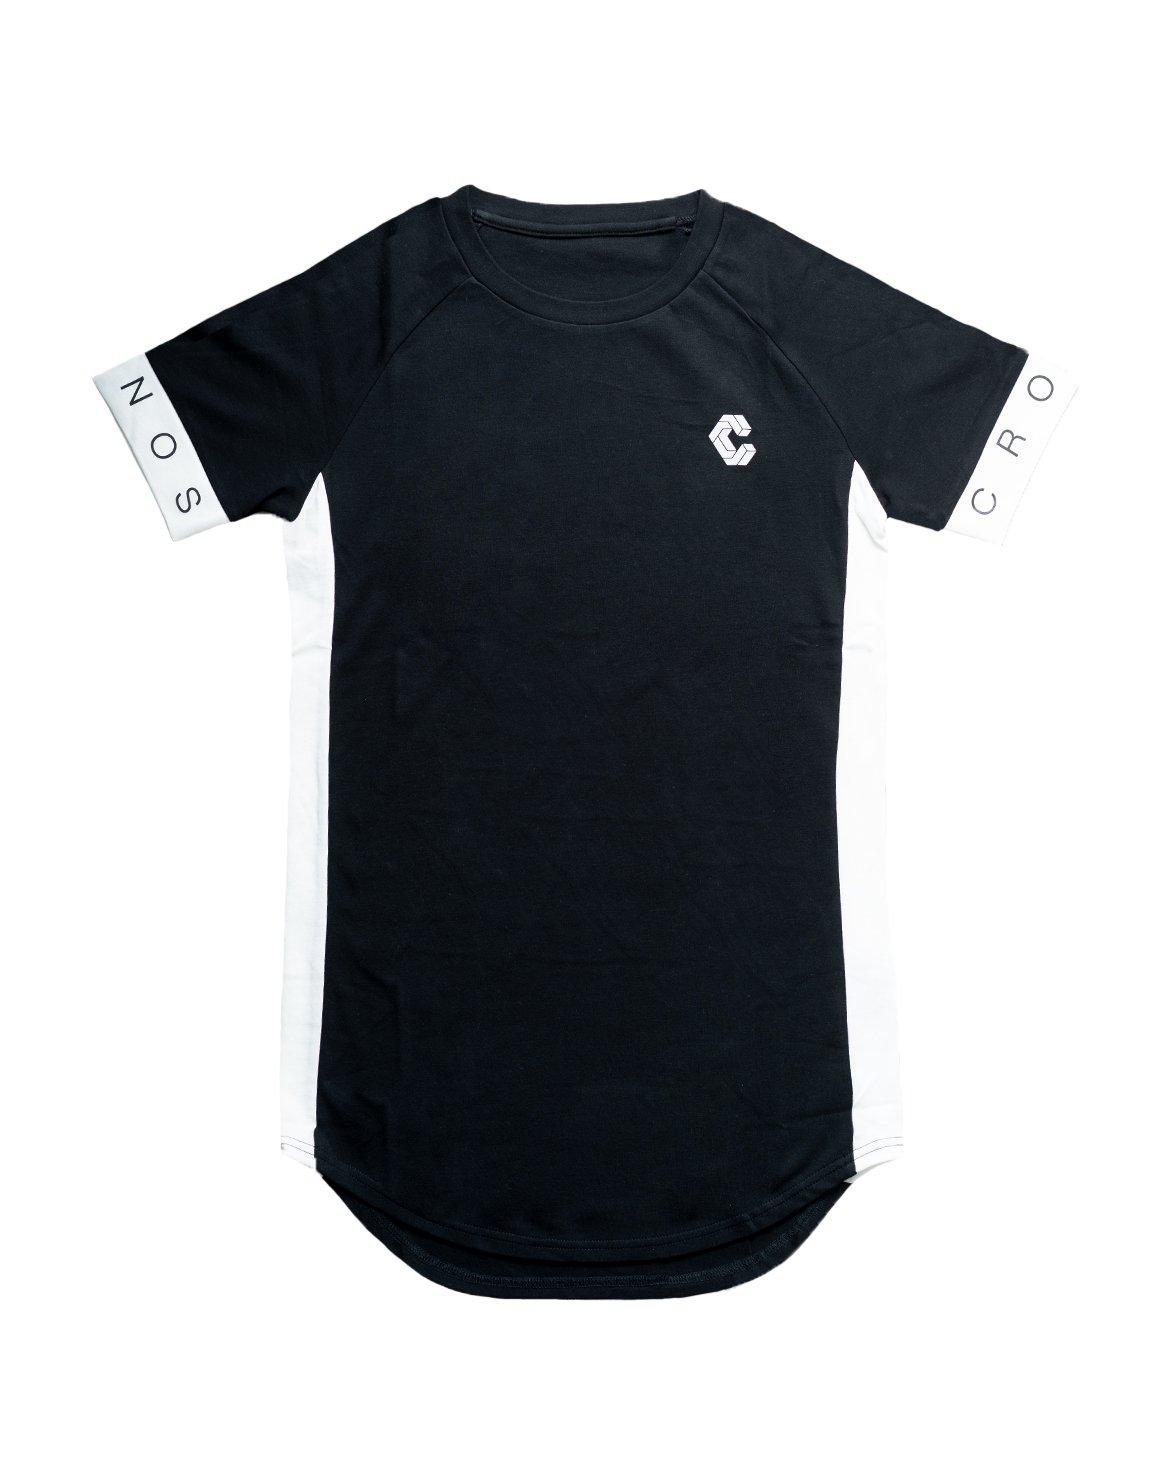 CUFF DESIGN LOGO TIGHT SIZE T-SHIRTS【BLACK】